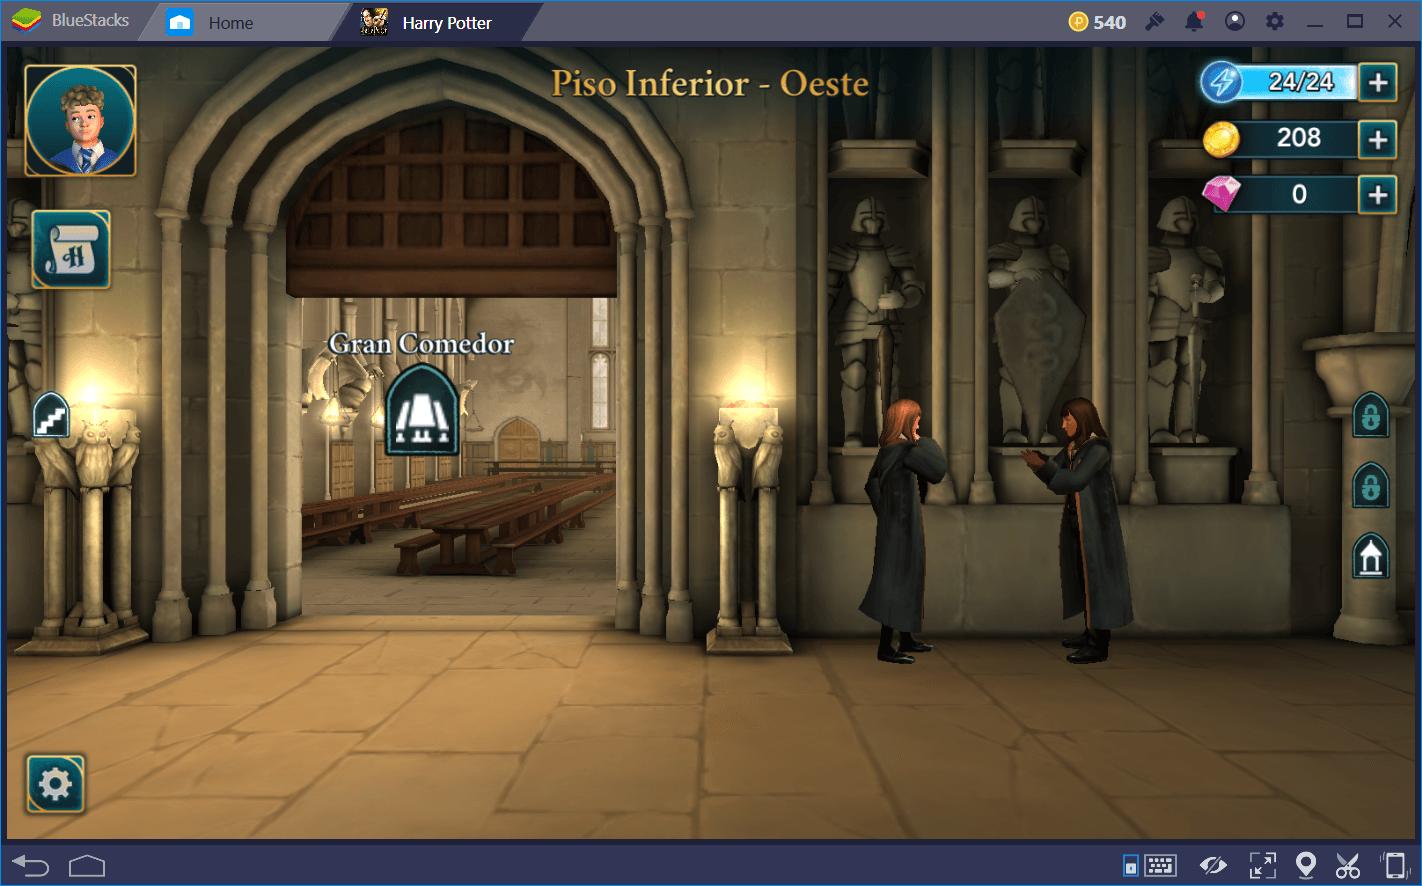 Cómo Administrar tu Energía en Harry Potter: Hogwarts Mystery